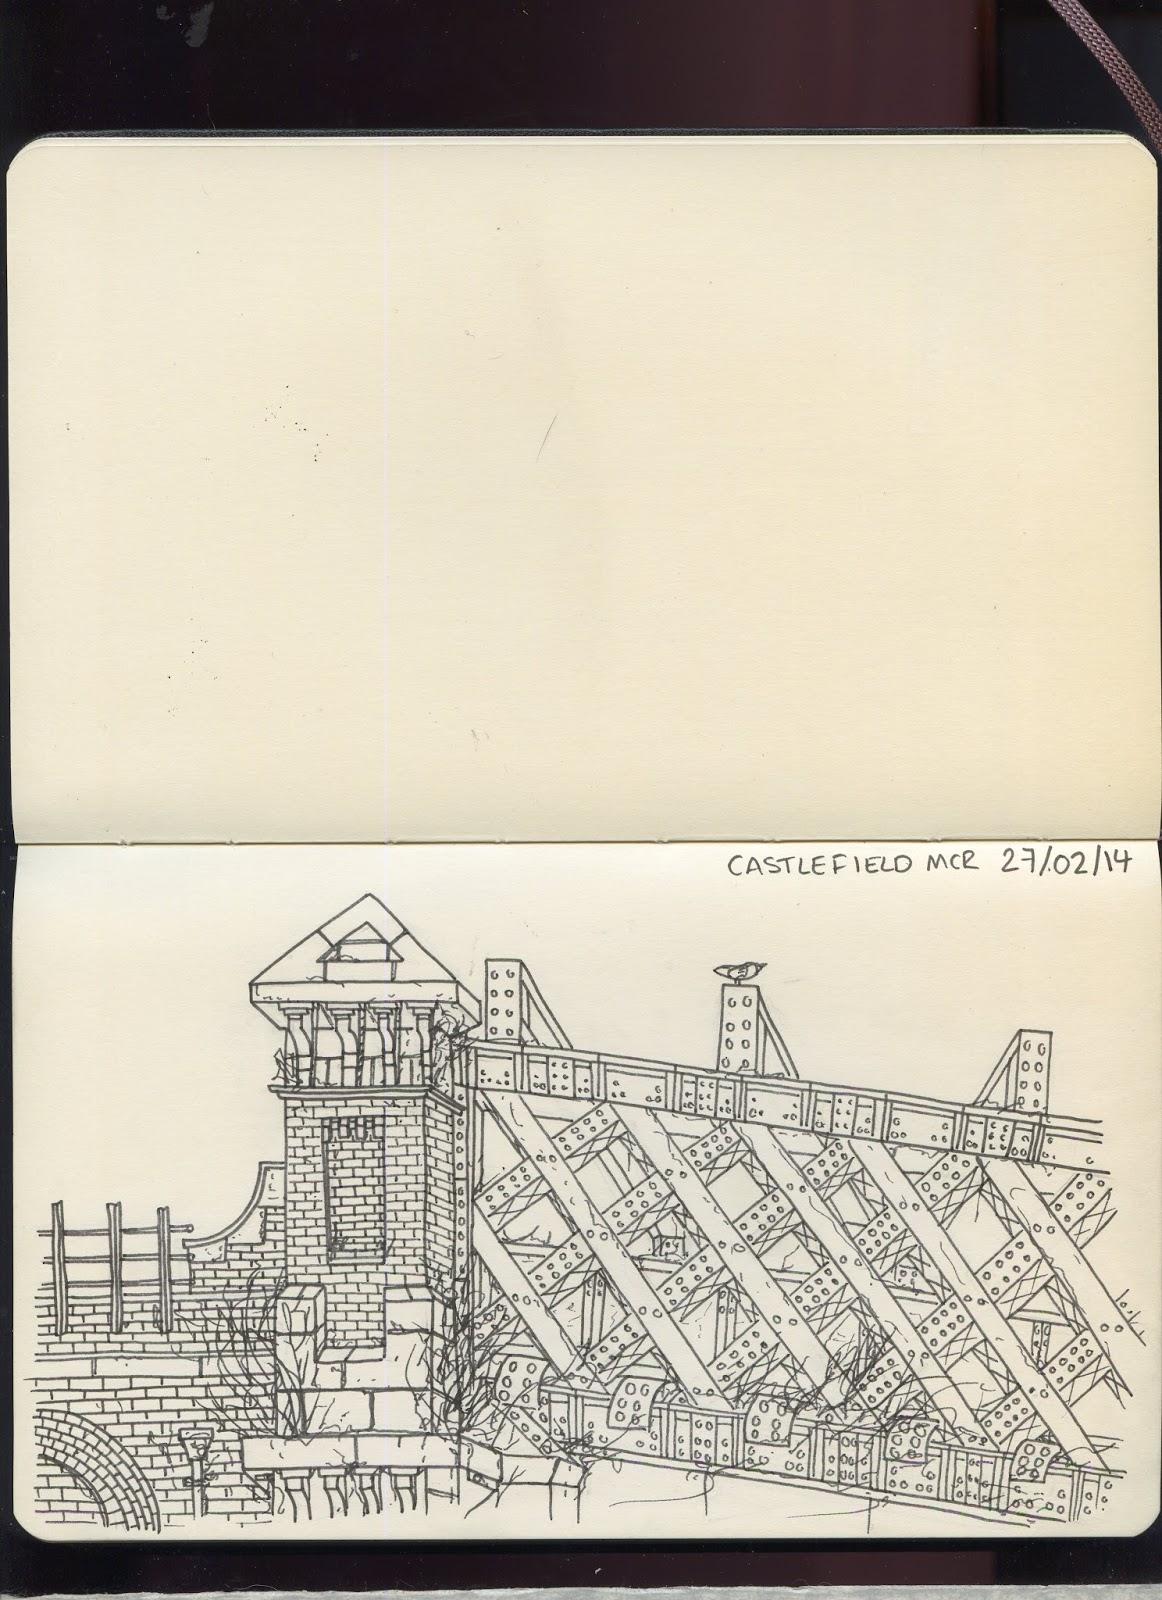 sketch, manchester, urbex, urban exploration, urban sketching, drawing, moleskine, castlefield, pen, ink, industrial, details, london road, bricks, walls, derelict,